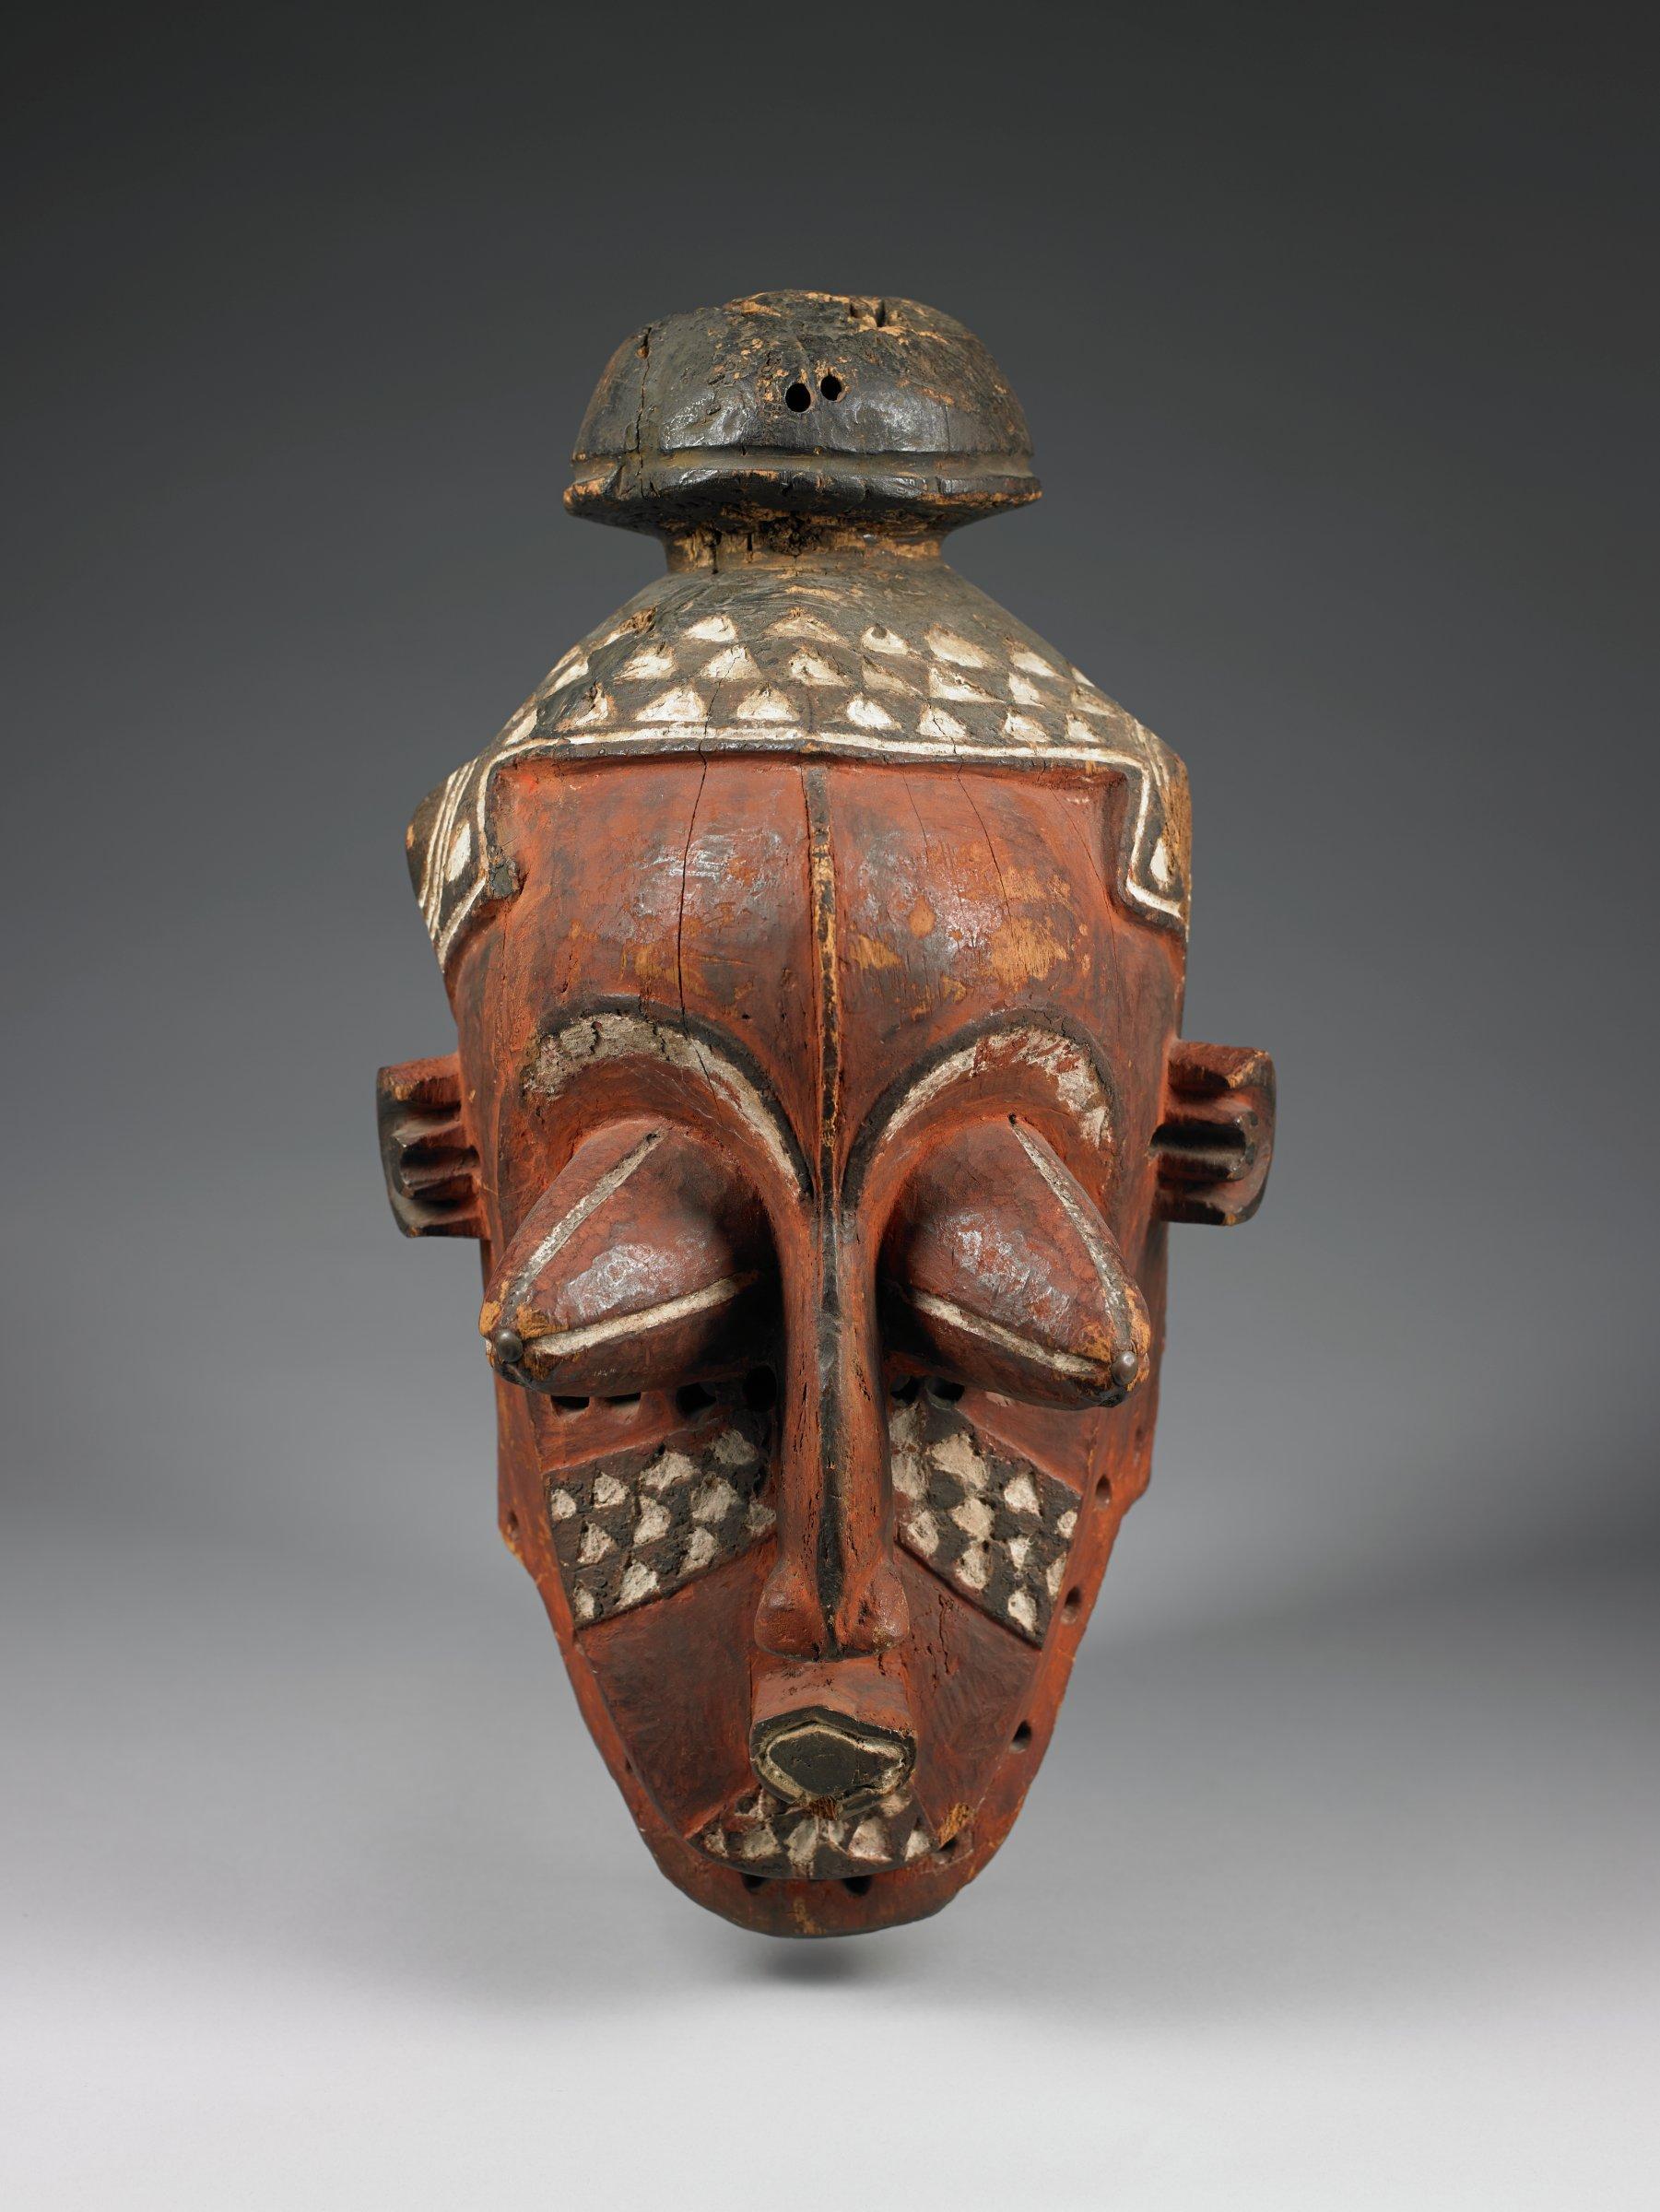 Helmet Mask, Biombo people, Democratic Republic of the Congo, African, wood, pigment, and metal